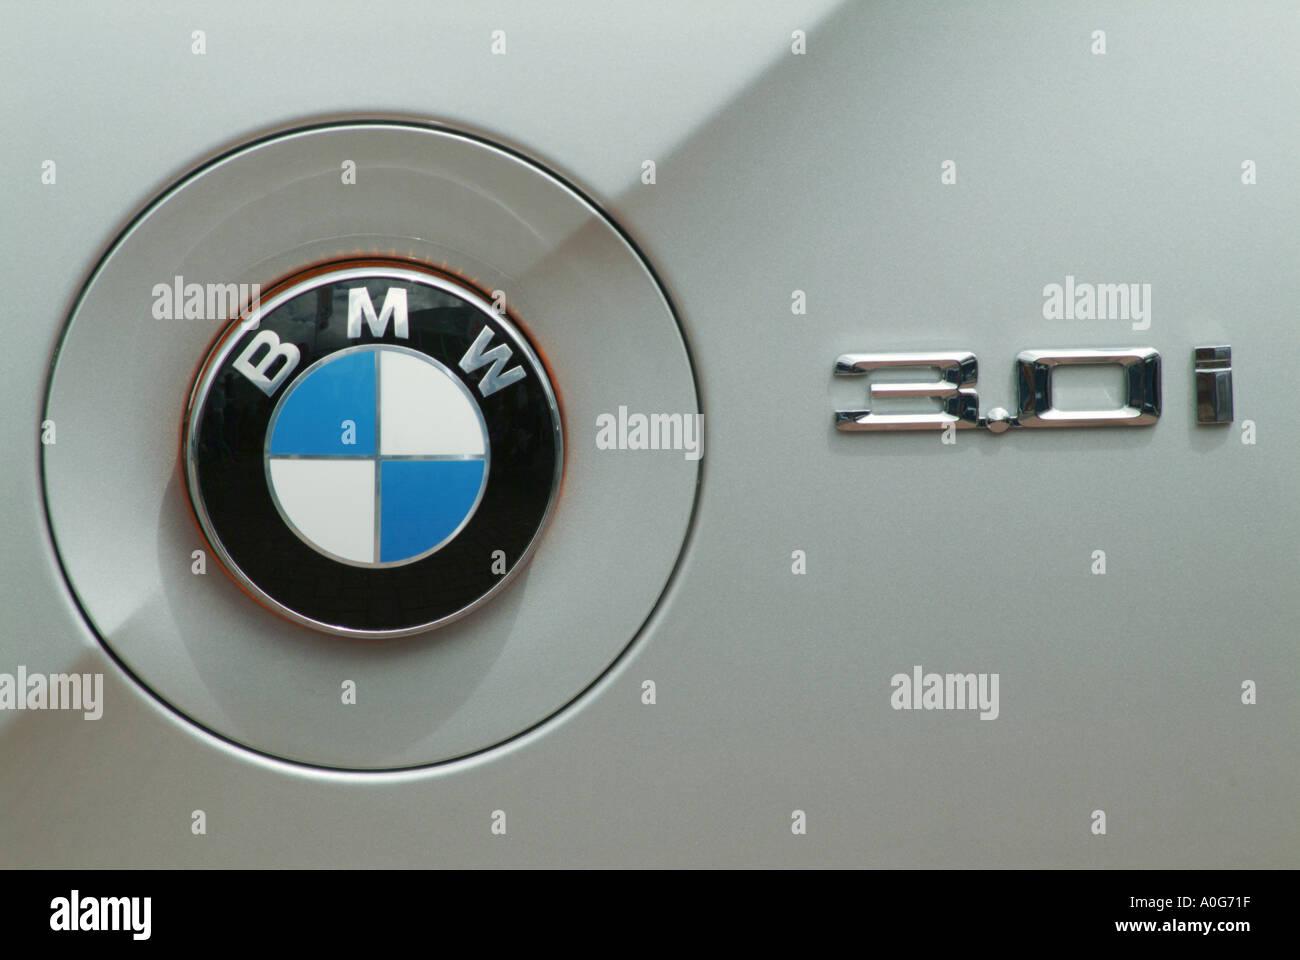 Bmw Badge Logo Stock Photos Bmw Badge Logo Stock Images Alamy